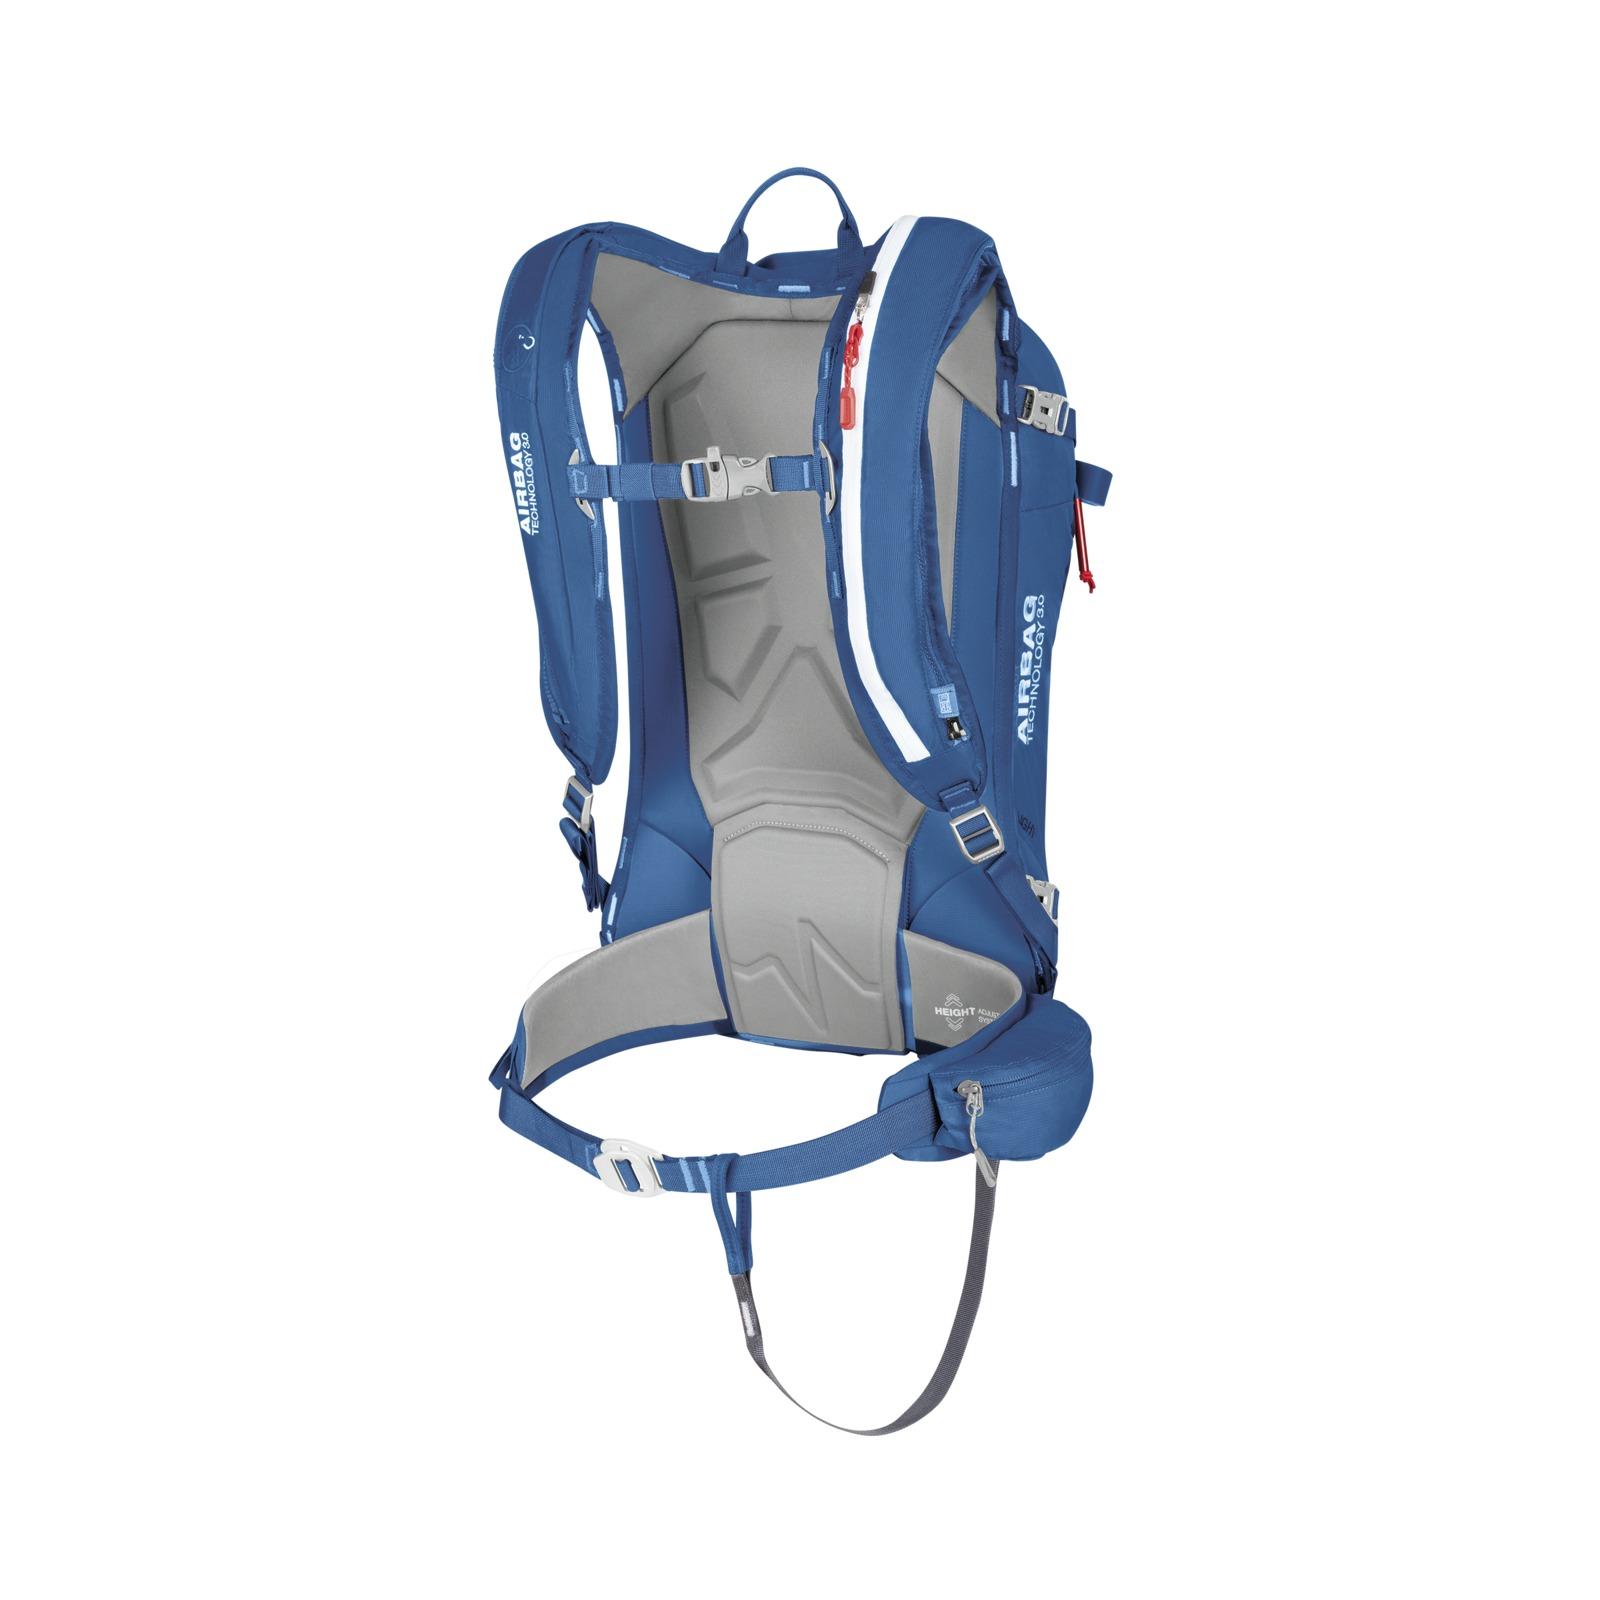 light-protection-airbag-3-0-ready_darkcyan.jpg